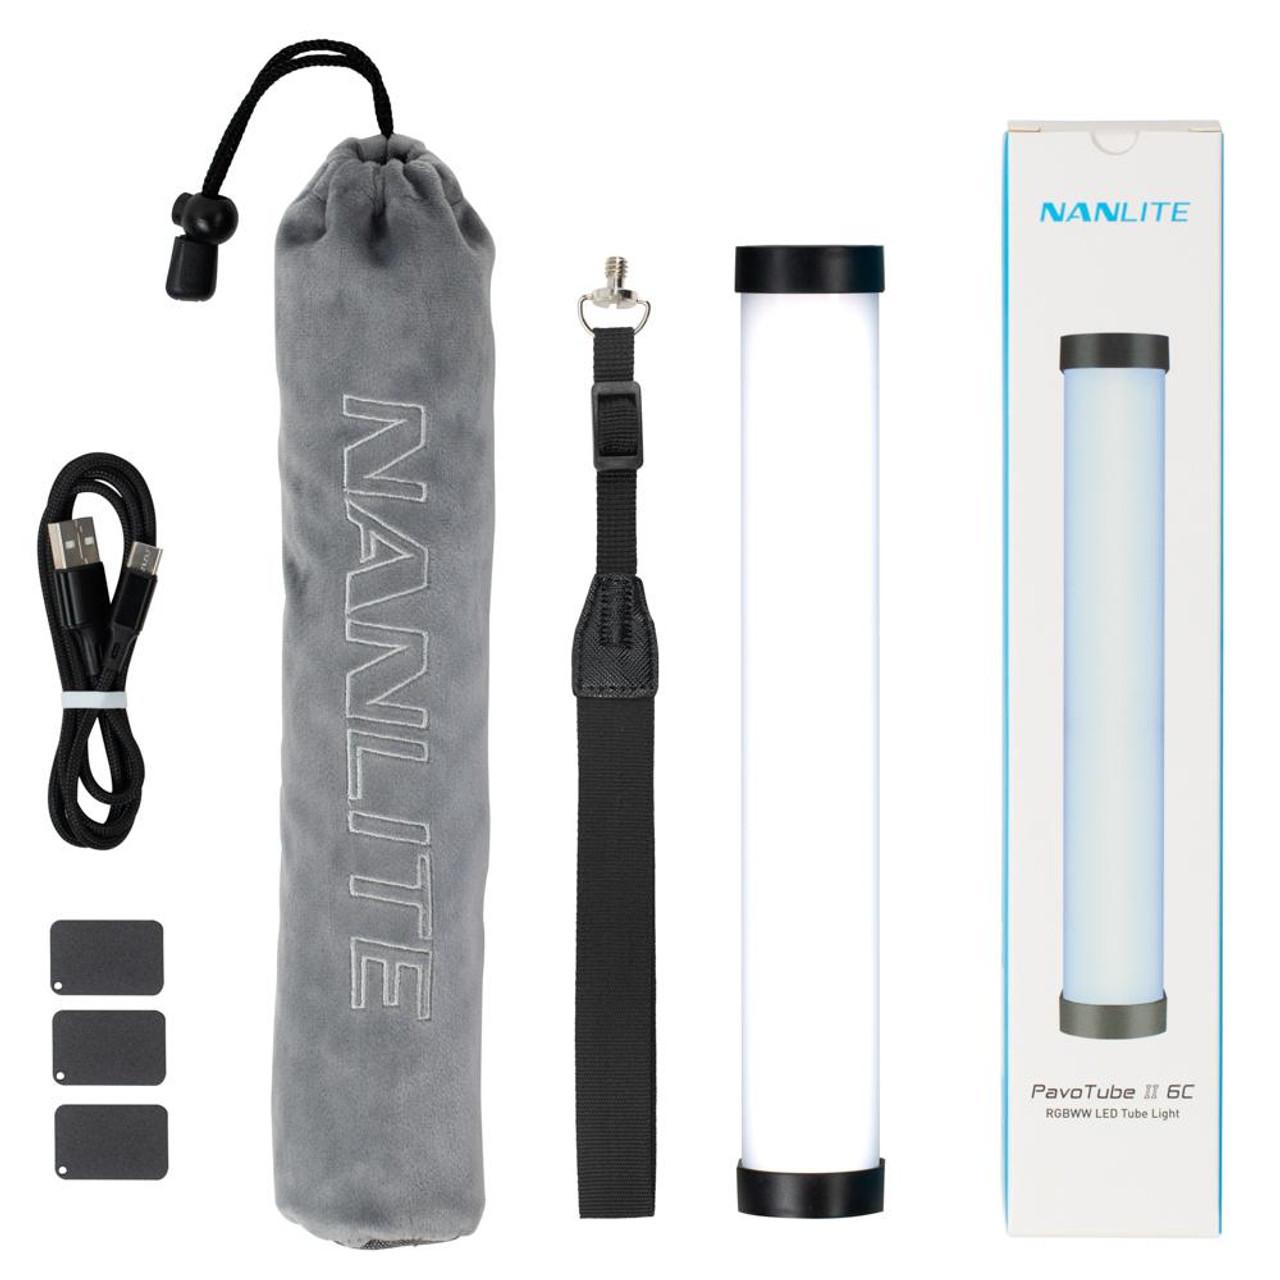 Nanlite PavoTube II 6C 10in 6w RGBWW LED Tube with Internal Battery